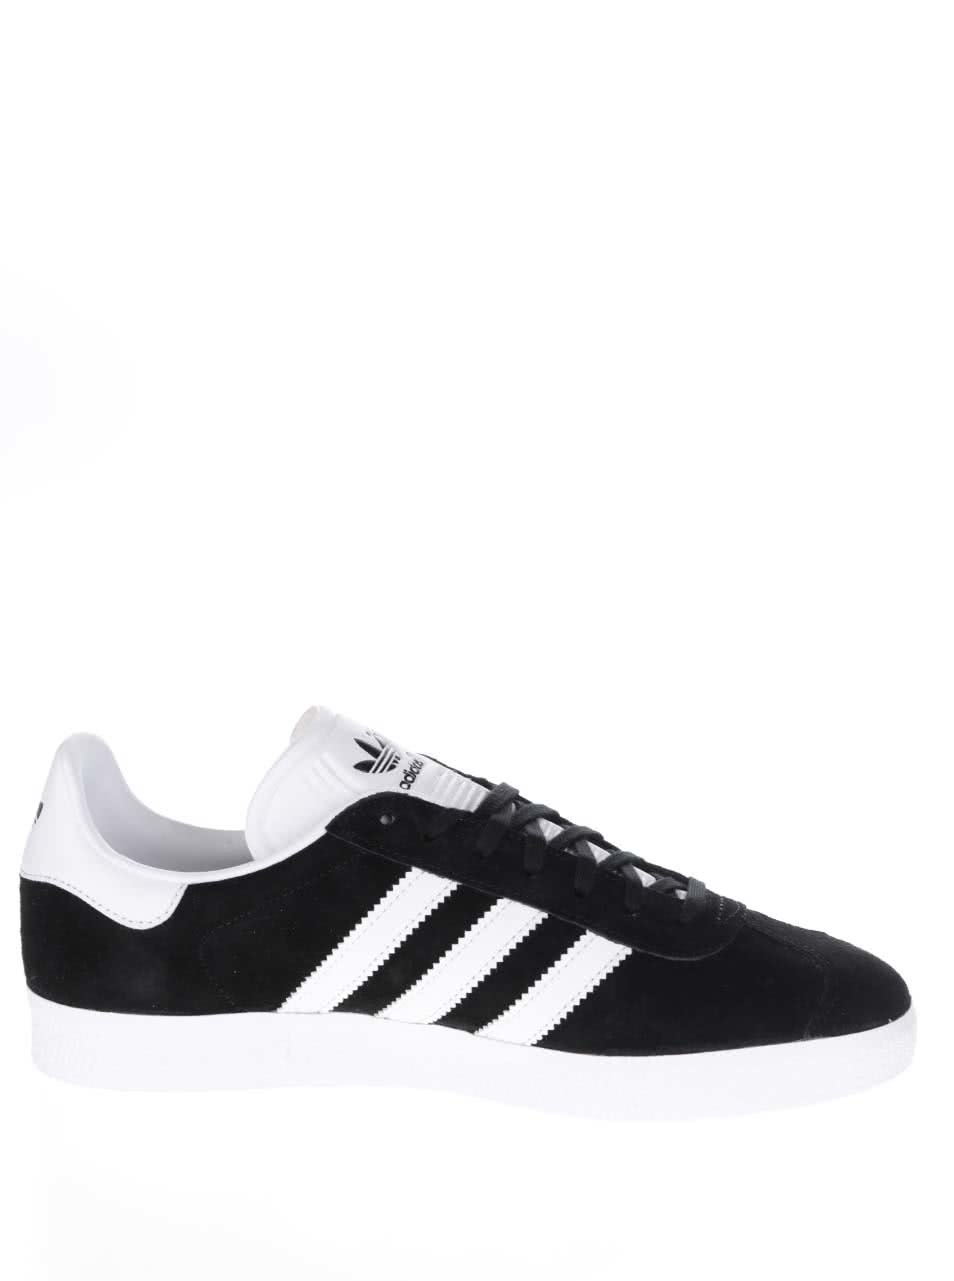 Čierne pánske semišové tenisky adidas Originals Gazelle ... 5903fb253d6